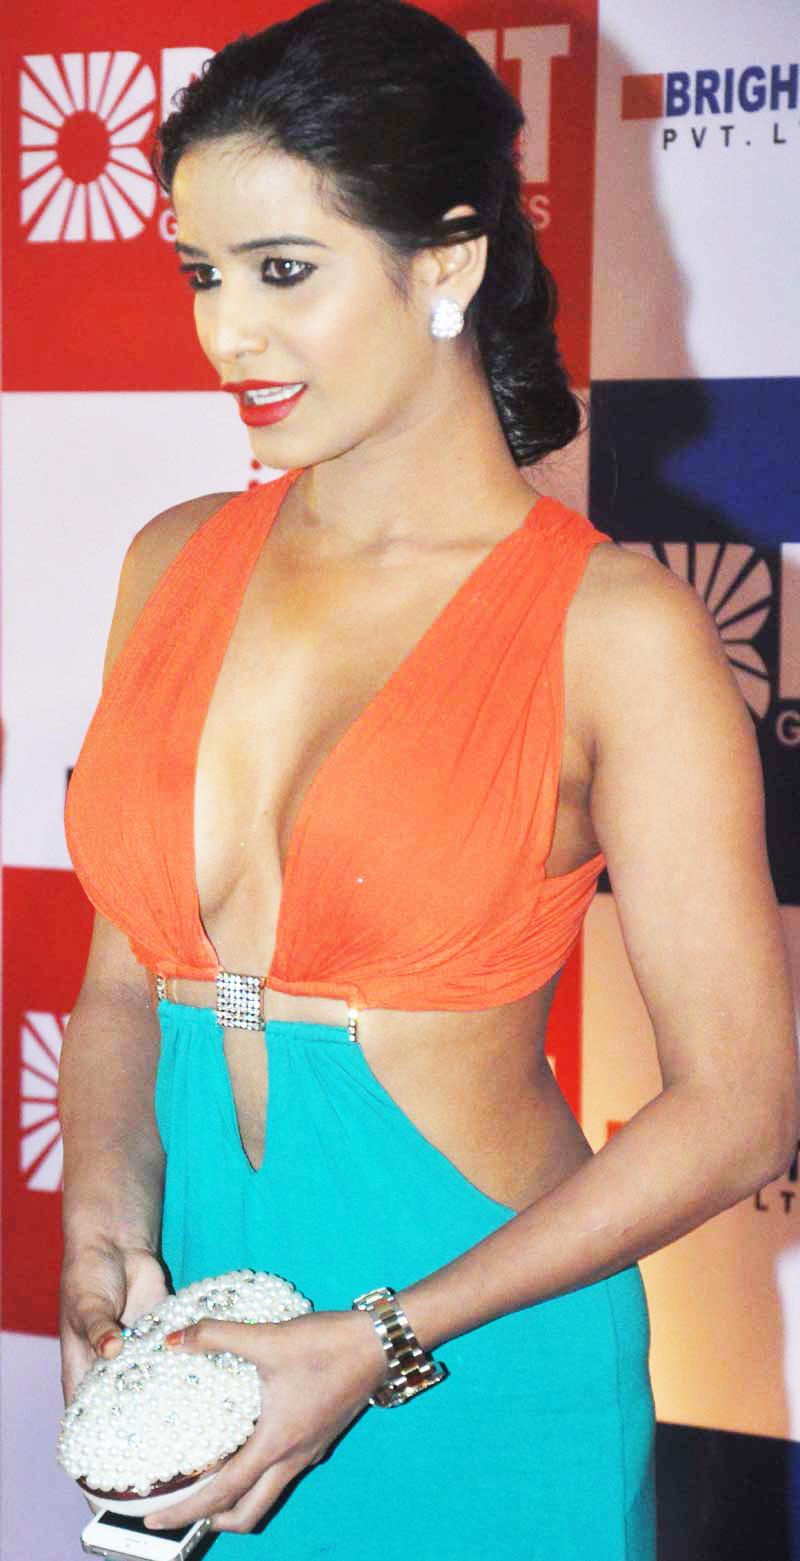 Poonam Panday in hot dress, Poonam Panday in tight dress, Poonam Panday hottest pics